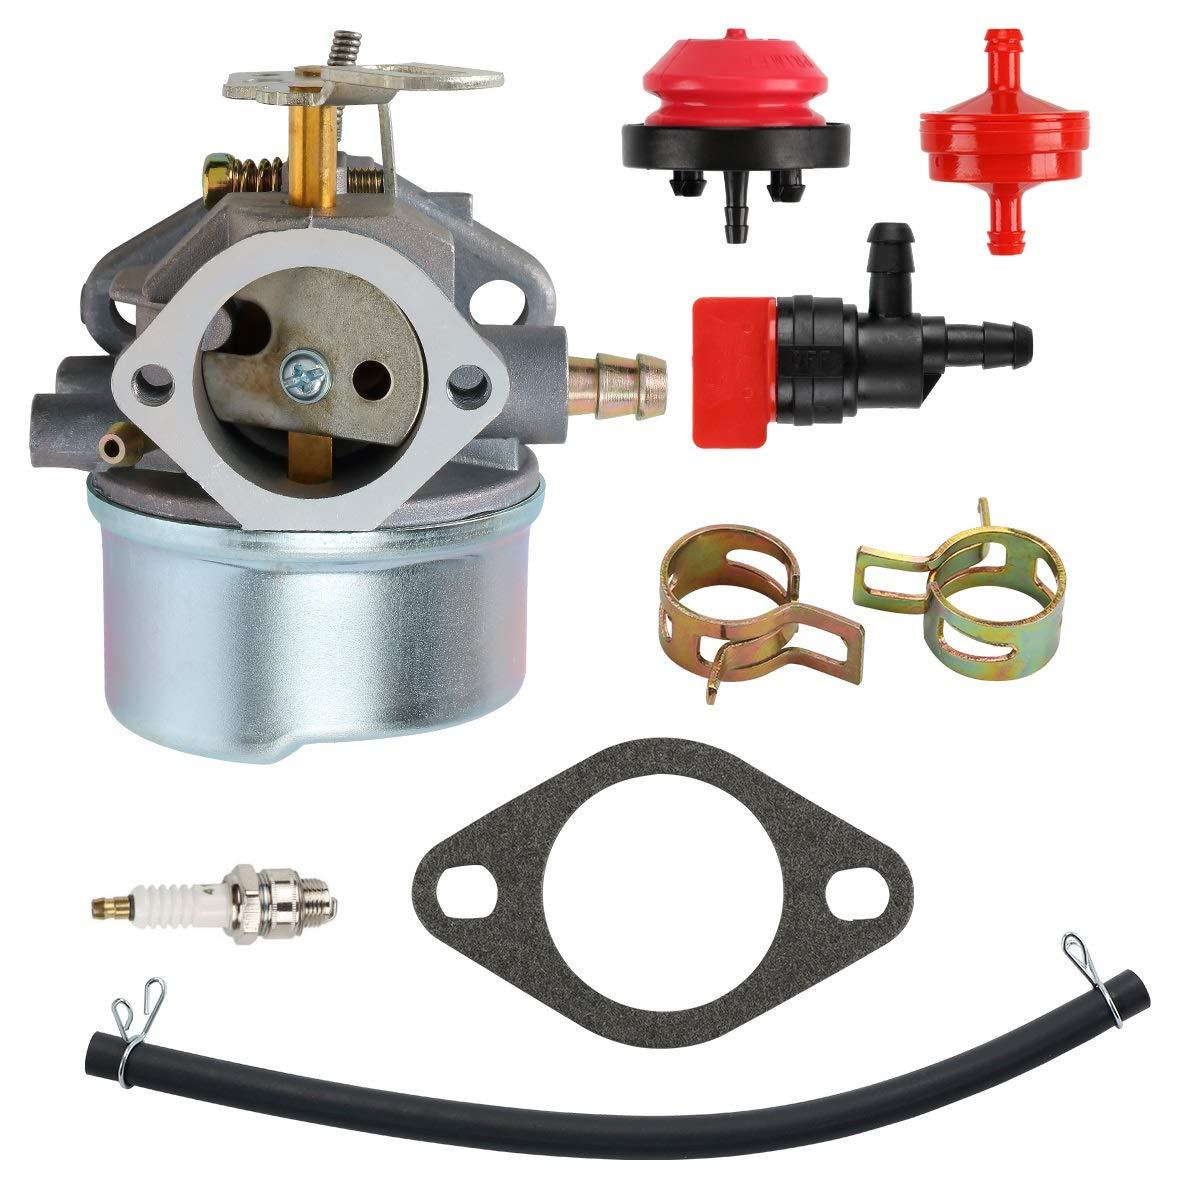 mdairc Carburetor for Tecumseh 640349 640052 640054 HMSK80 HMSK90 LH318SA LH358SA 8HP 9HP 10HP Snowblower Generator Chipper Carb